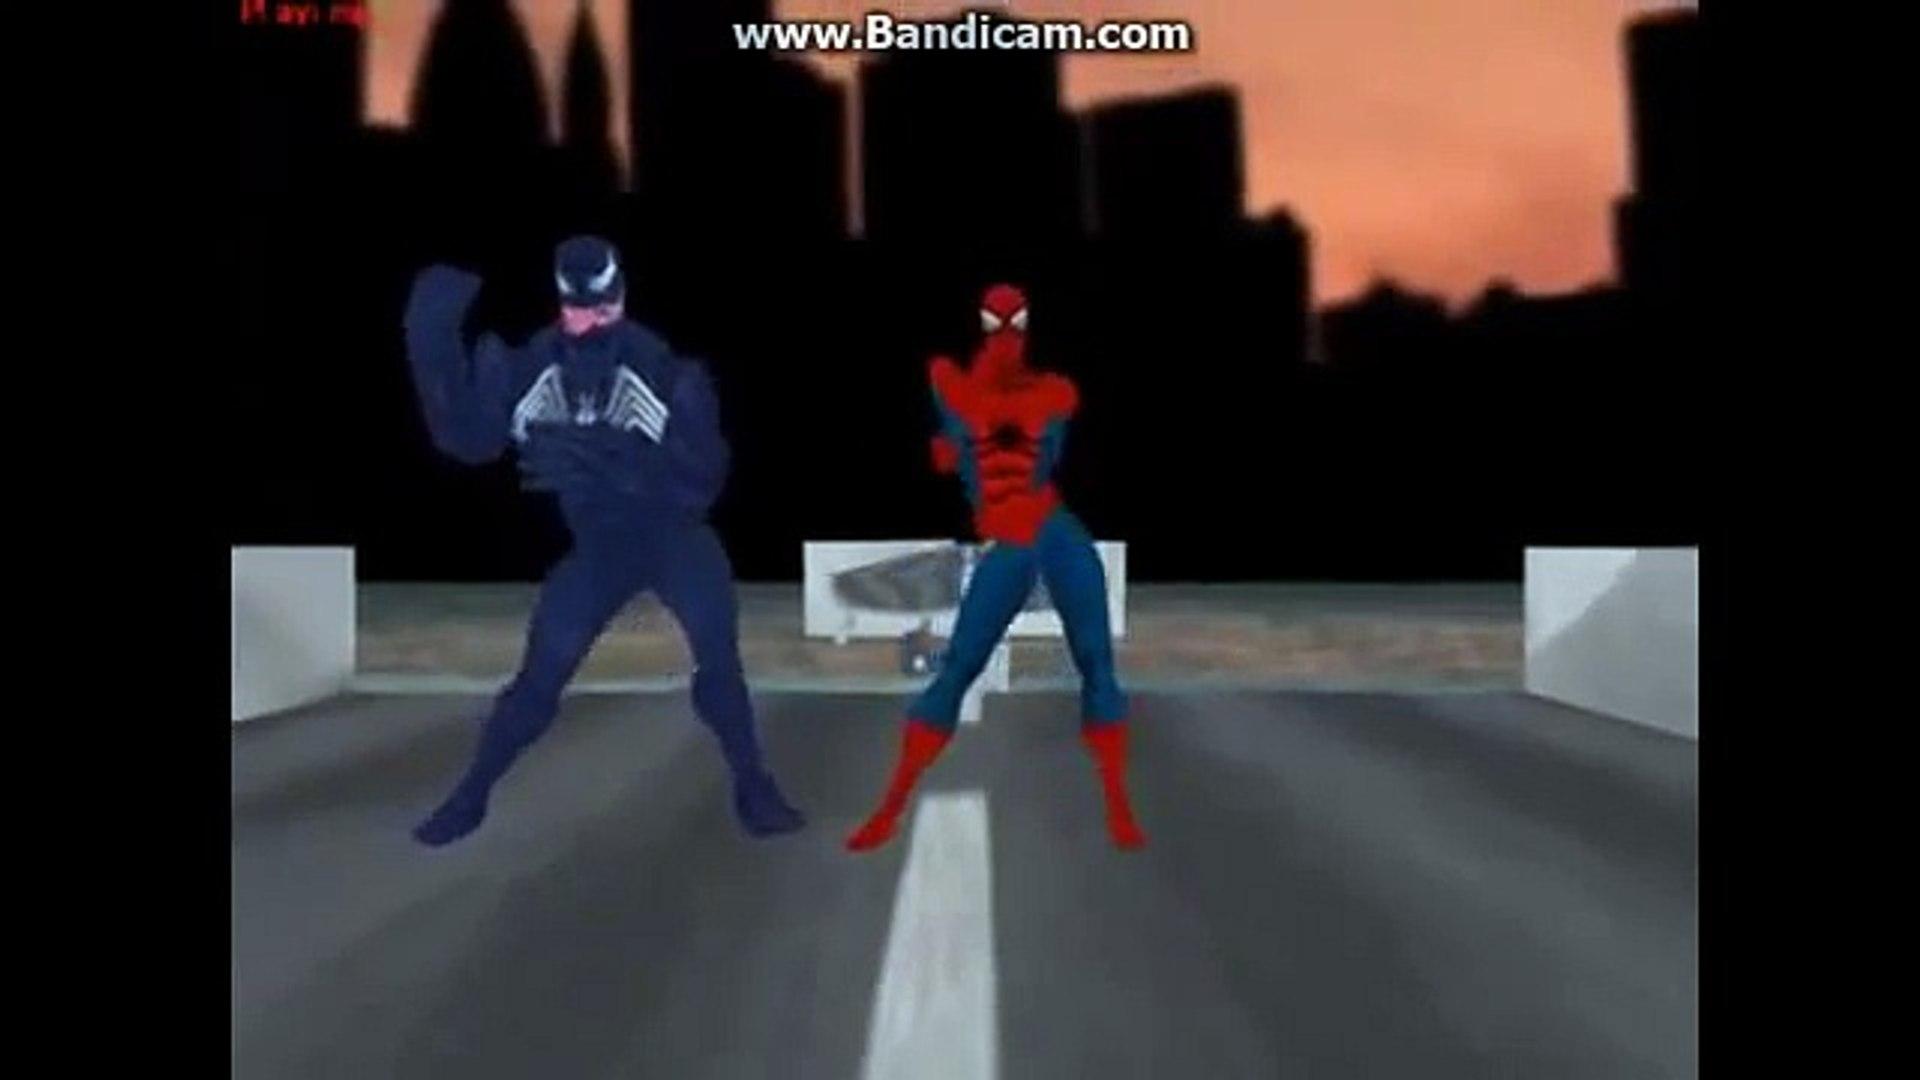 Spiderman do Gentleman (PSY Parody) ☆ 3D animated mashup parody